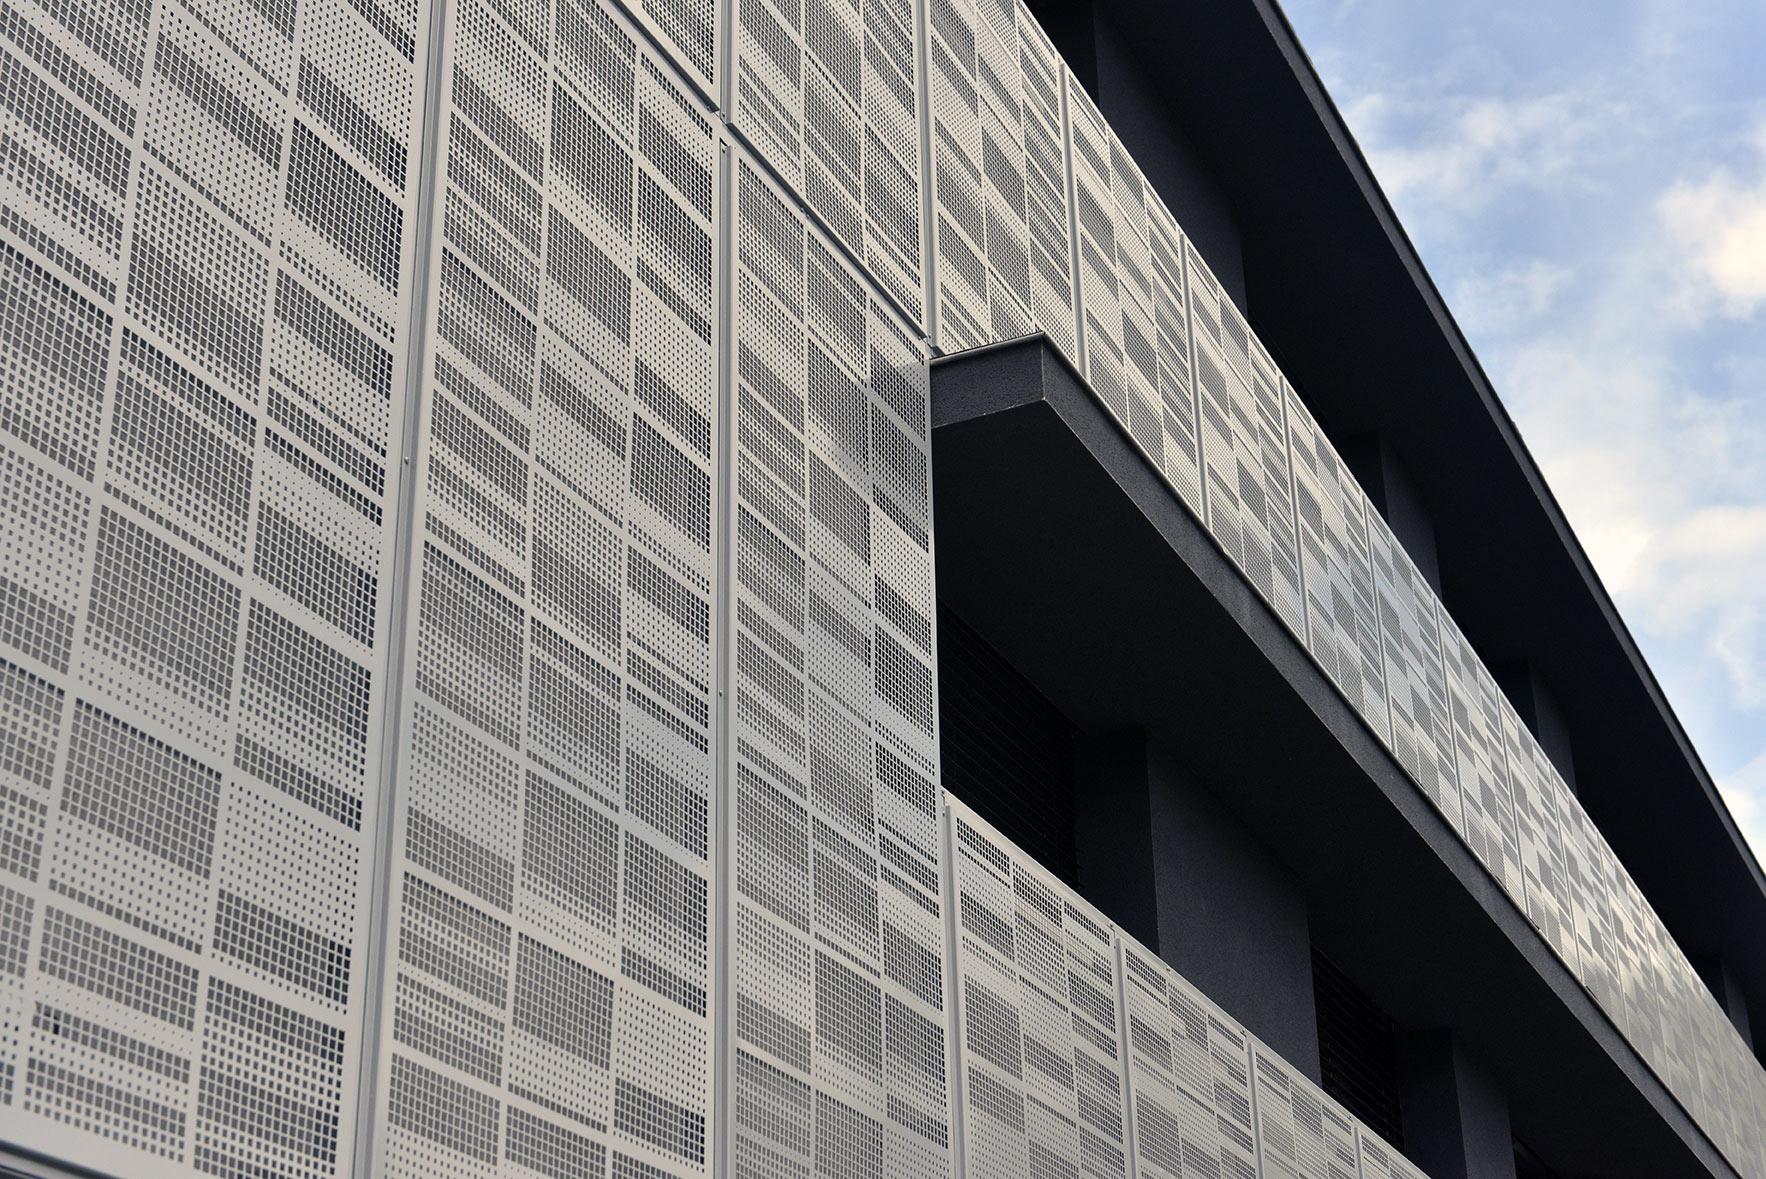 slides archive immeuble saint germain. Black Bedroom Furniture Sets. Home Design Ideas